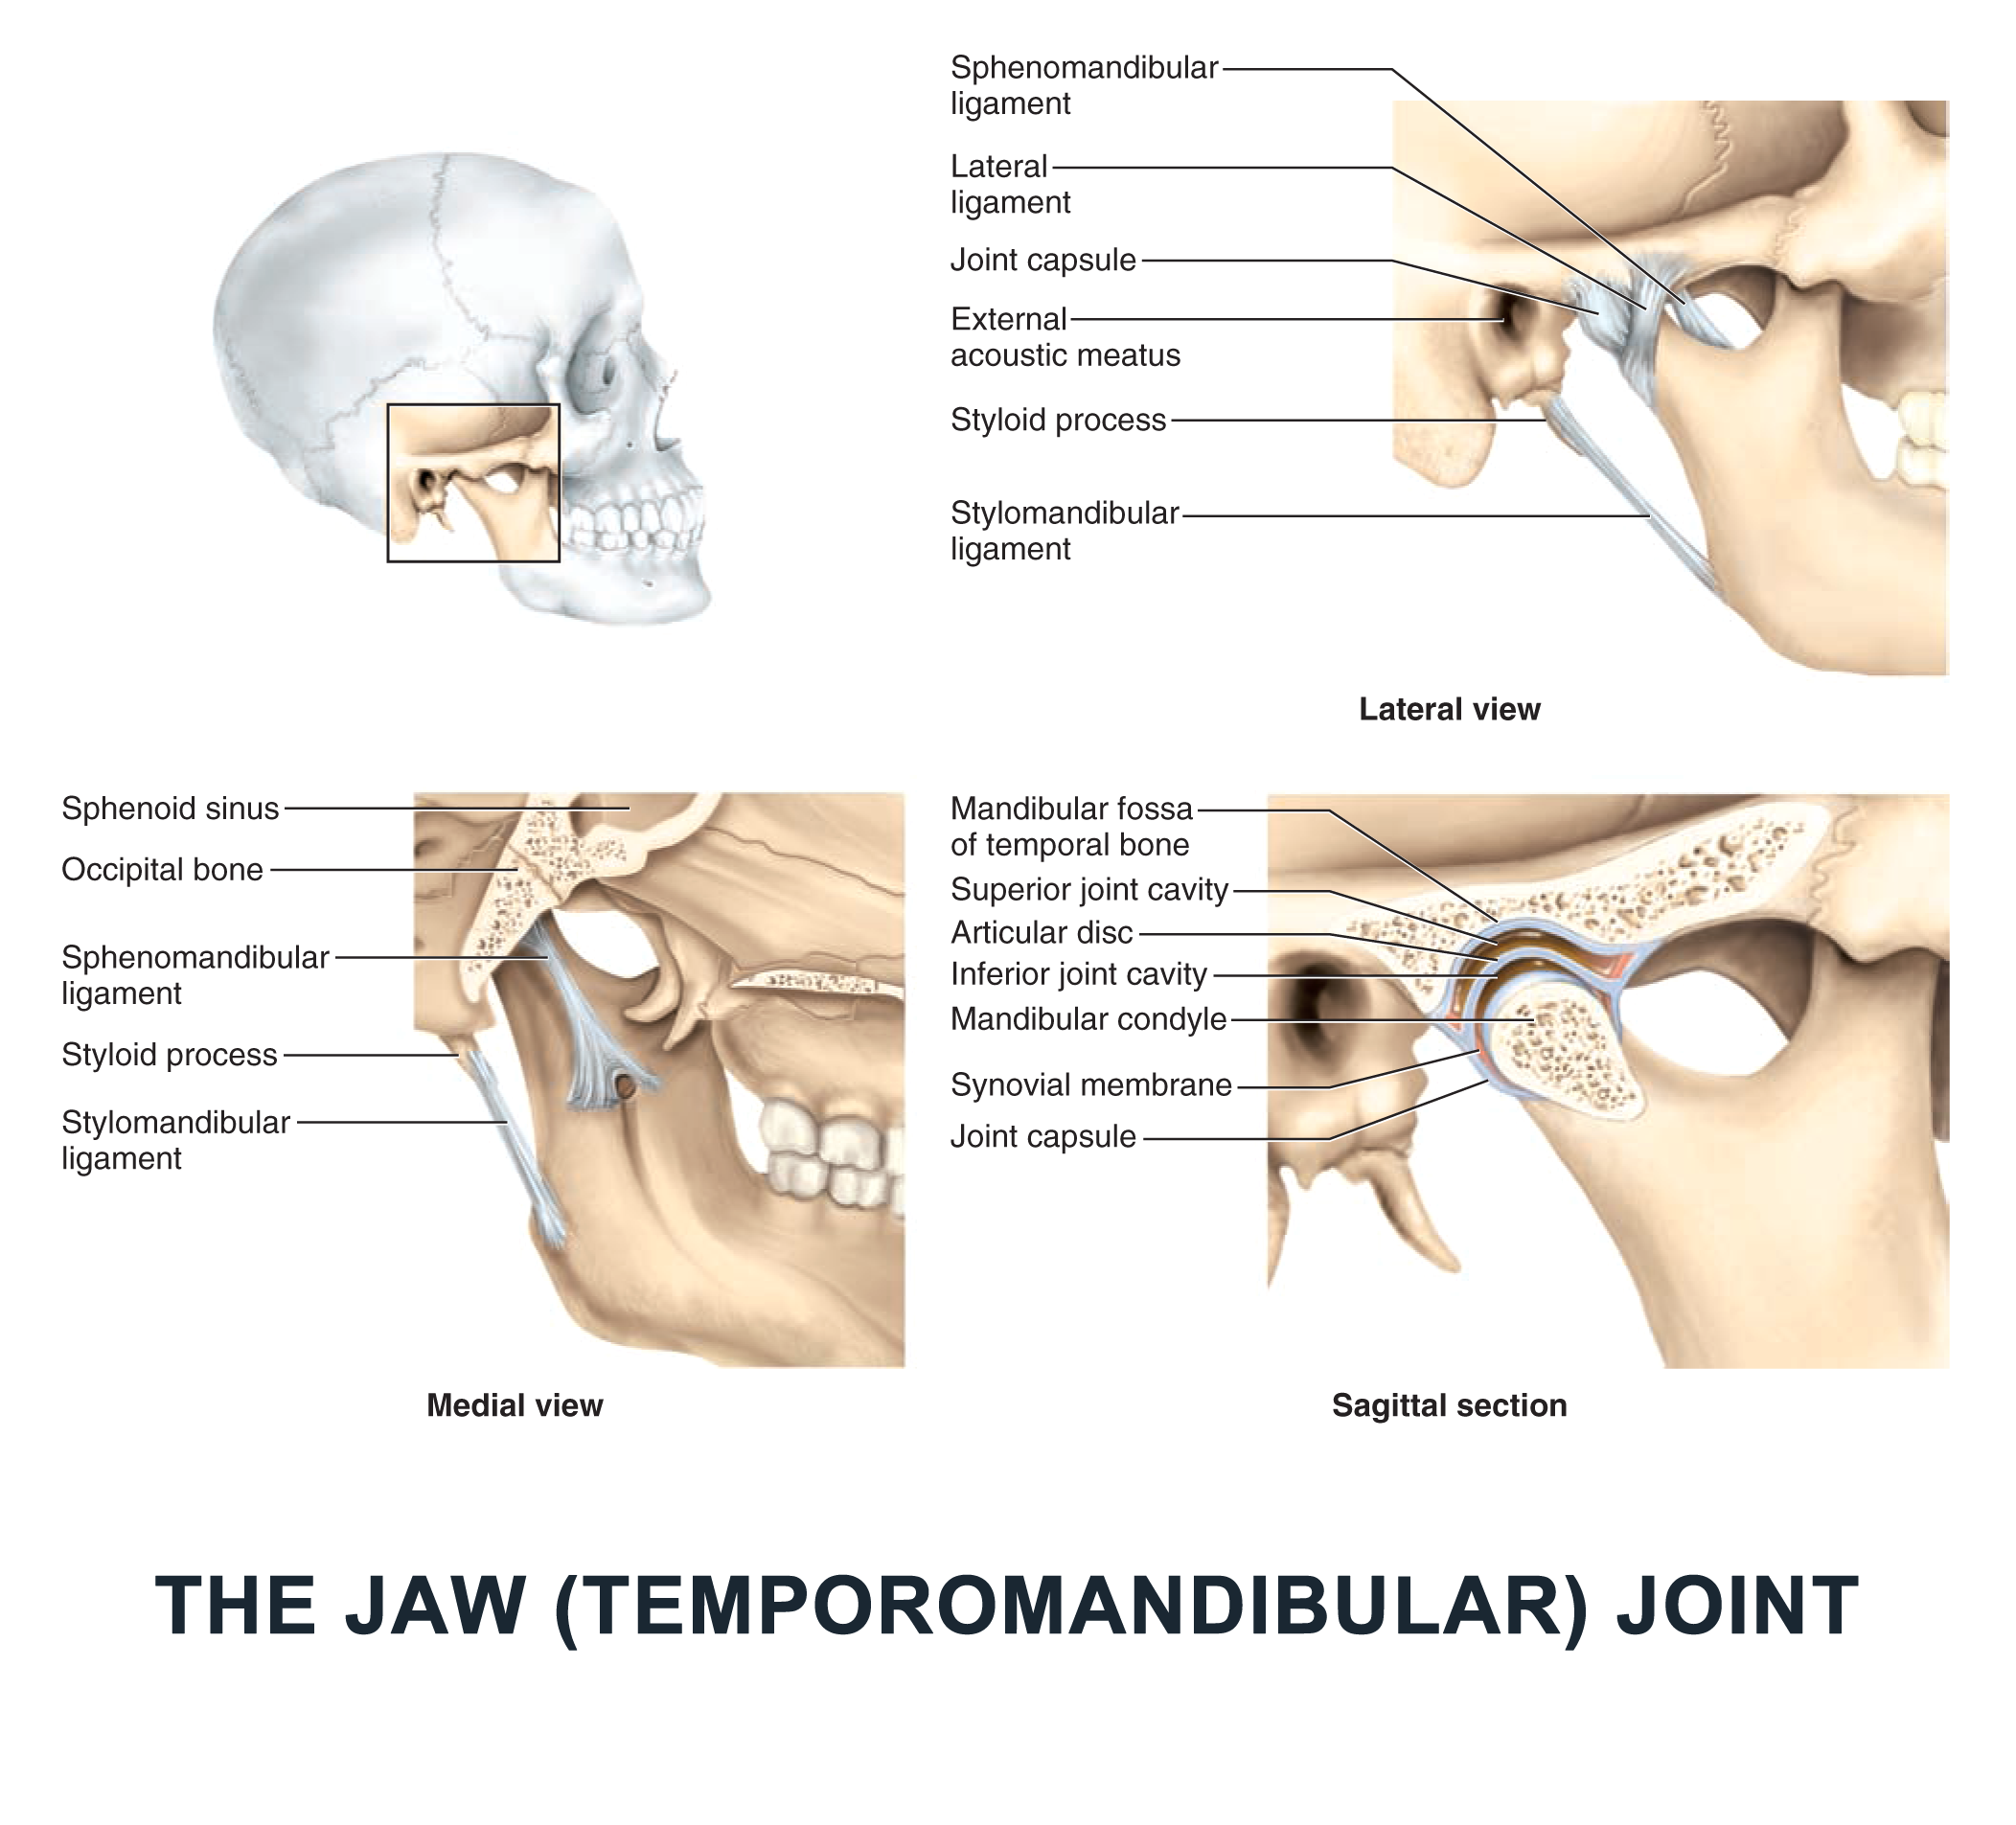 the jaw temporomandibular joint anatomy images illustrations anatomy images character design [ 2104 x 1905 Pixel ]